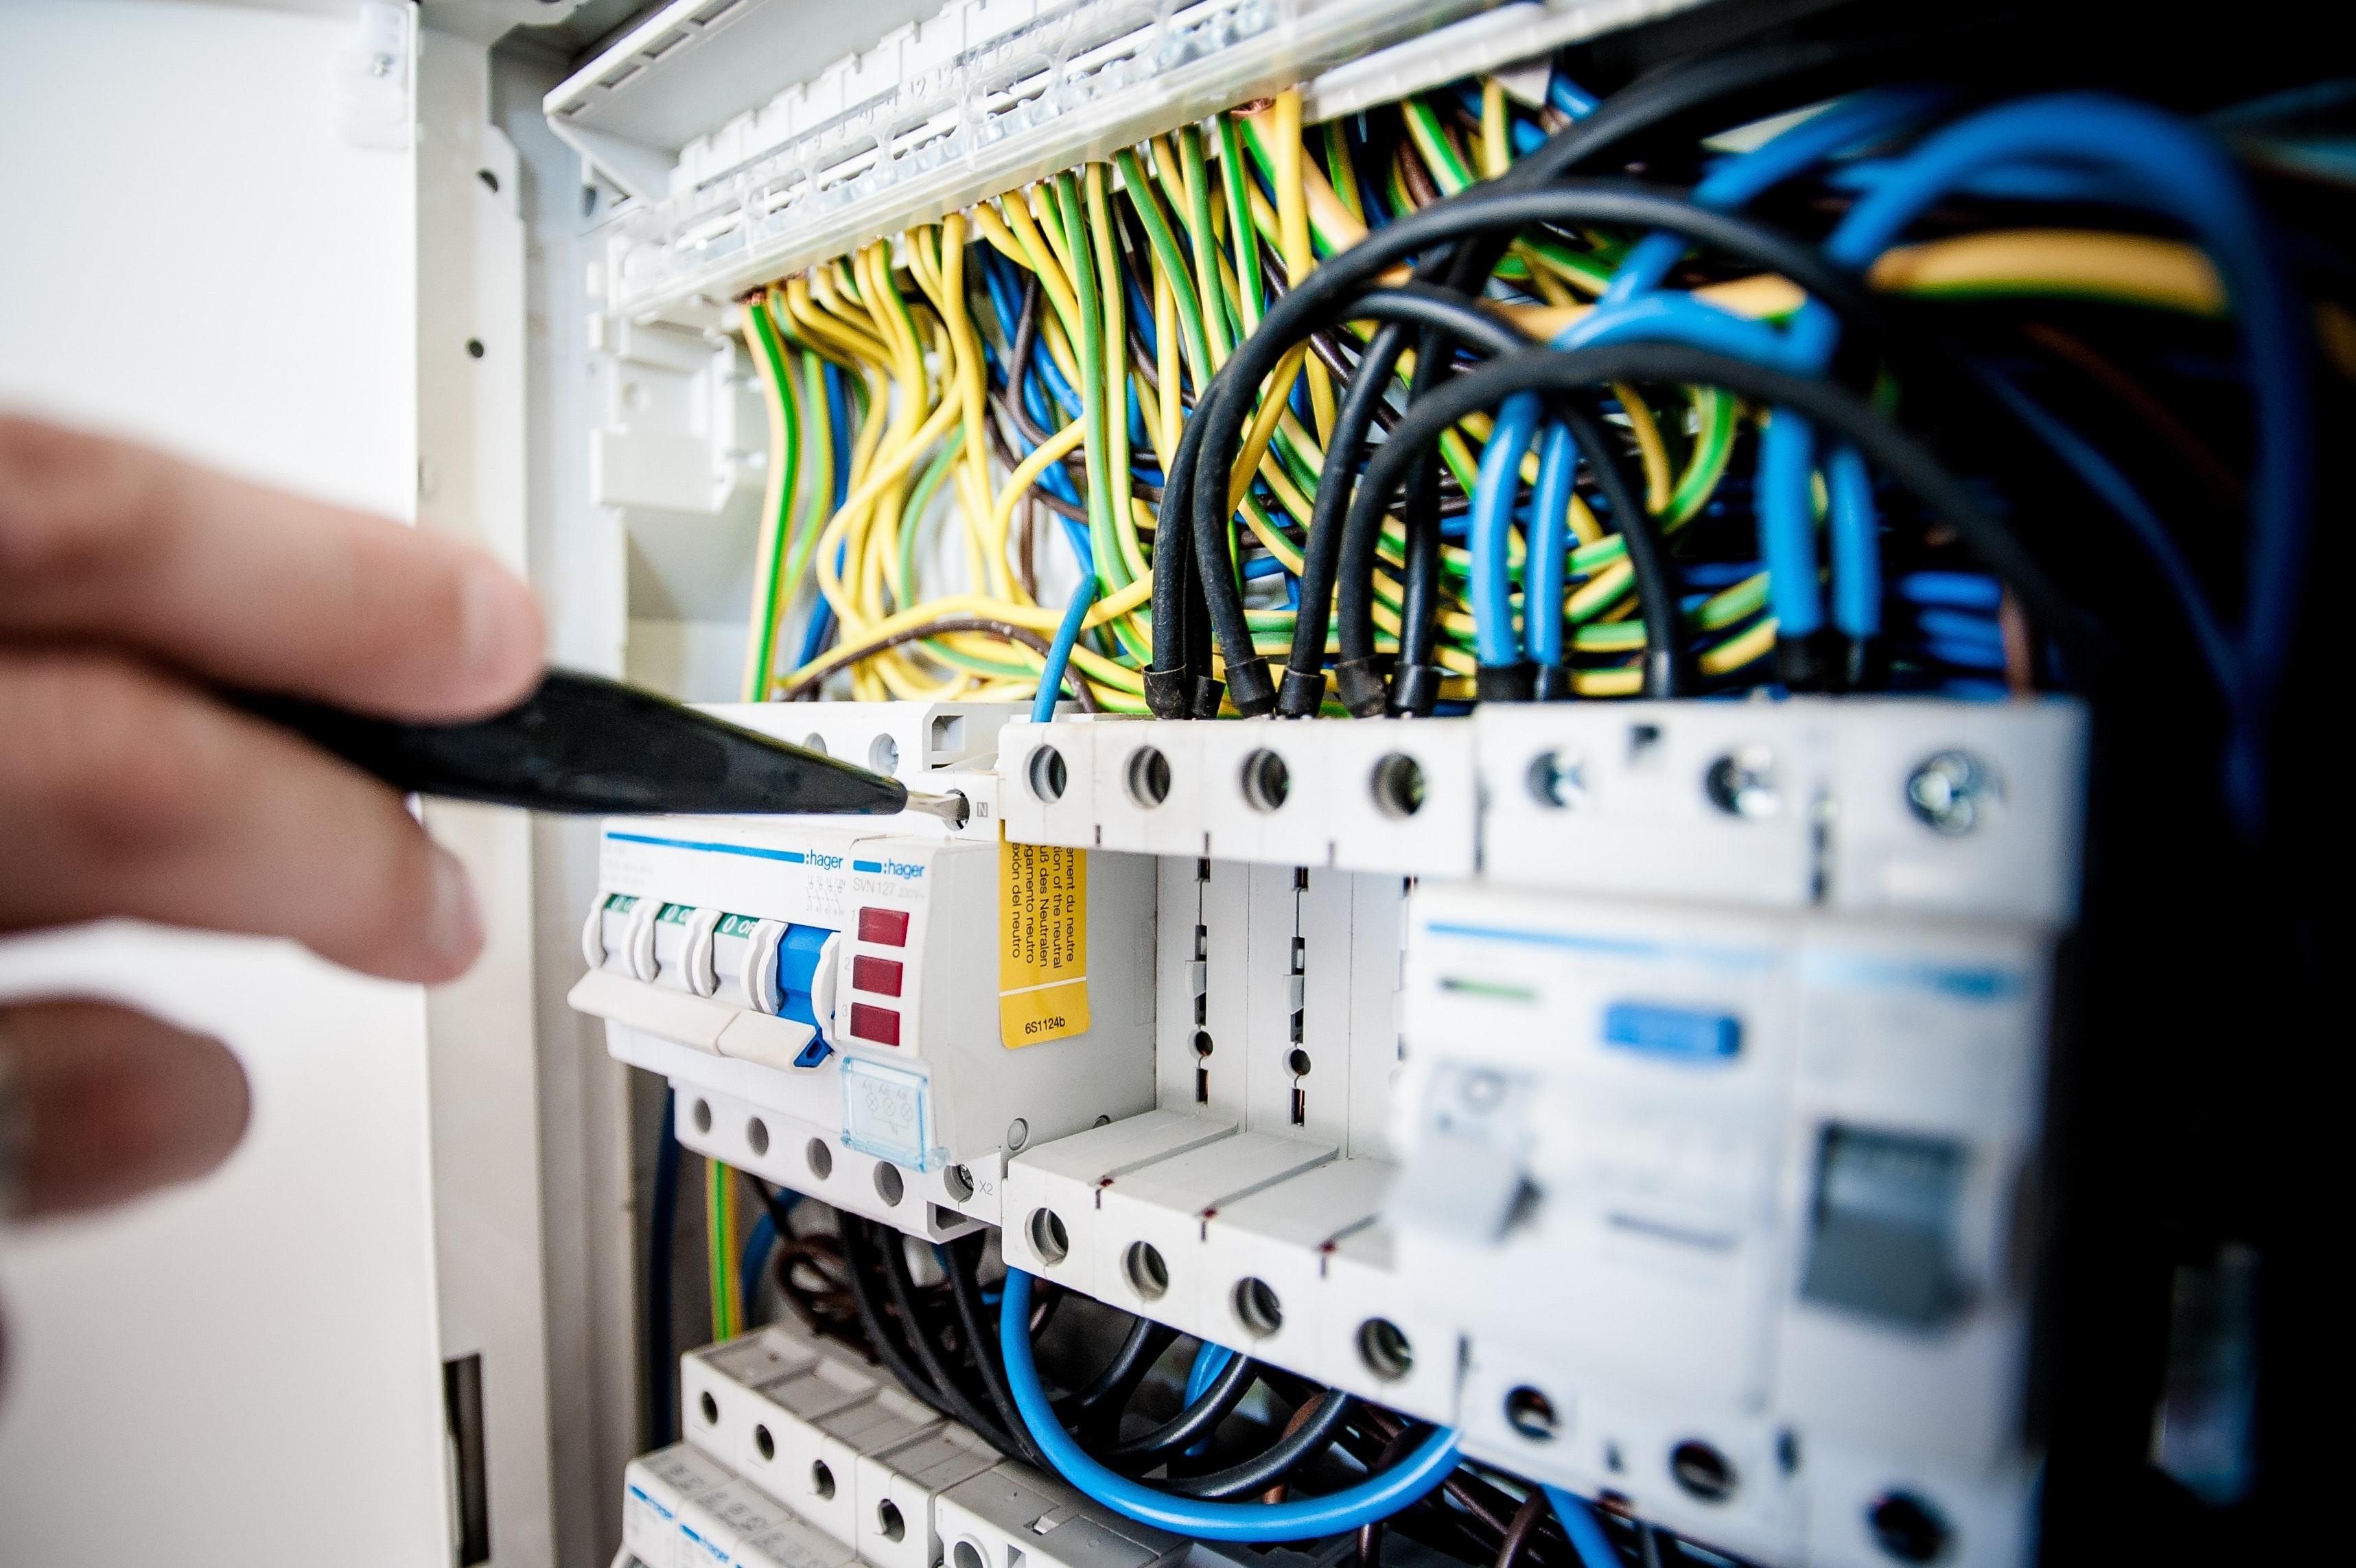 cables-close-up-computer-257736